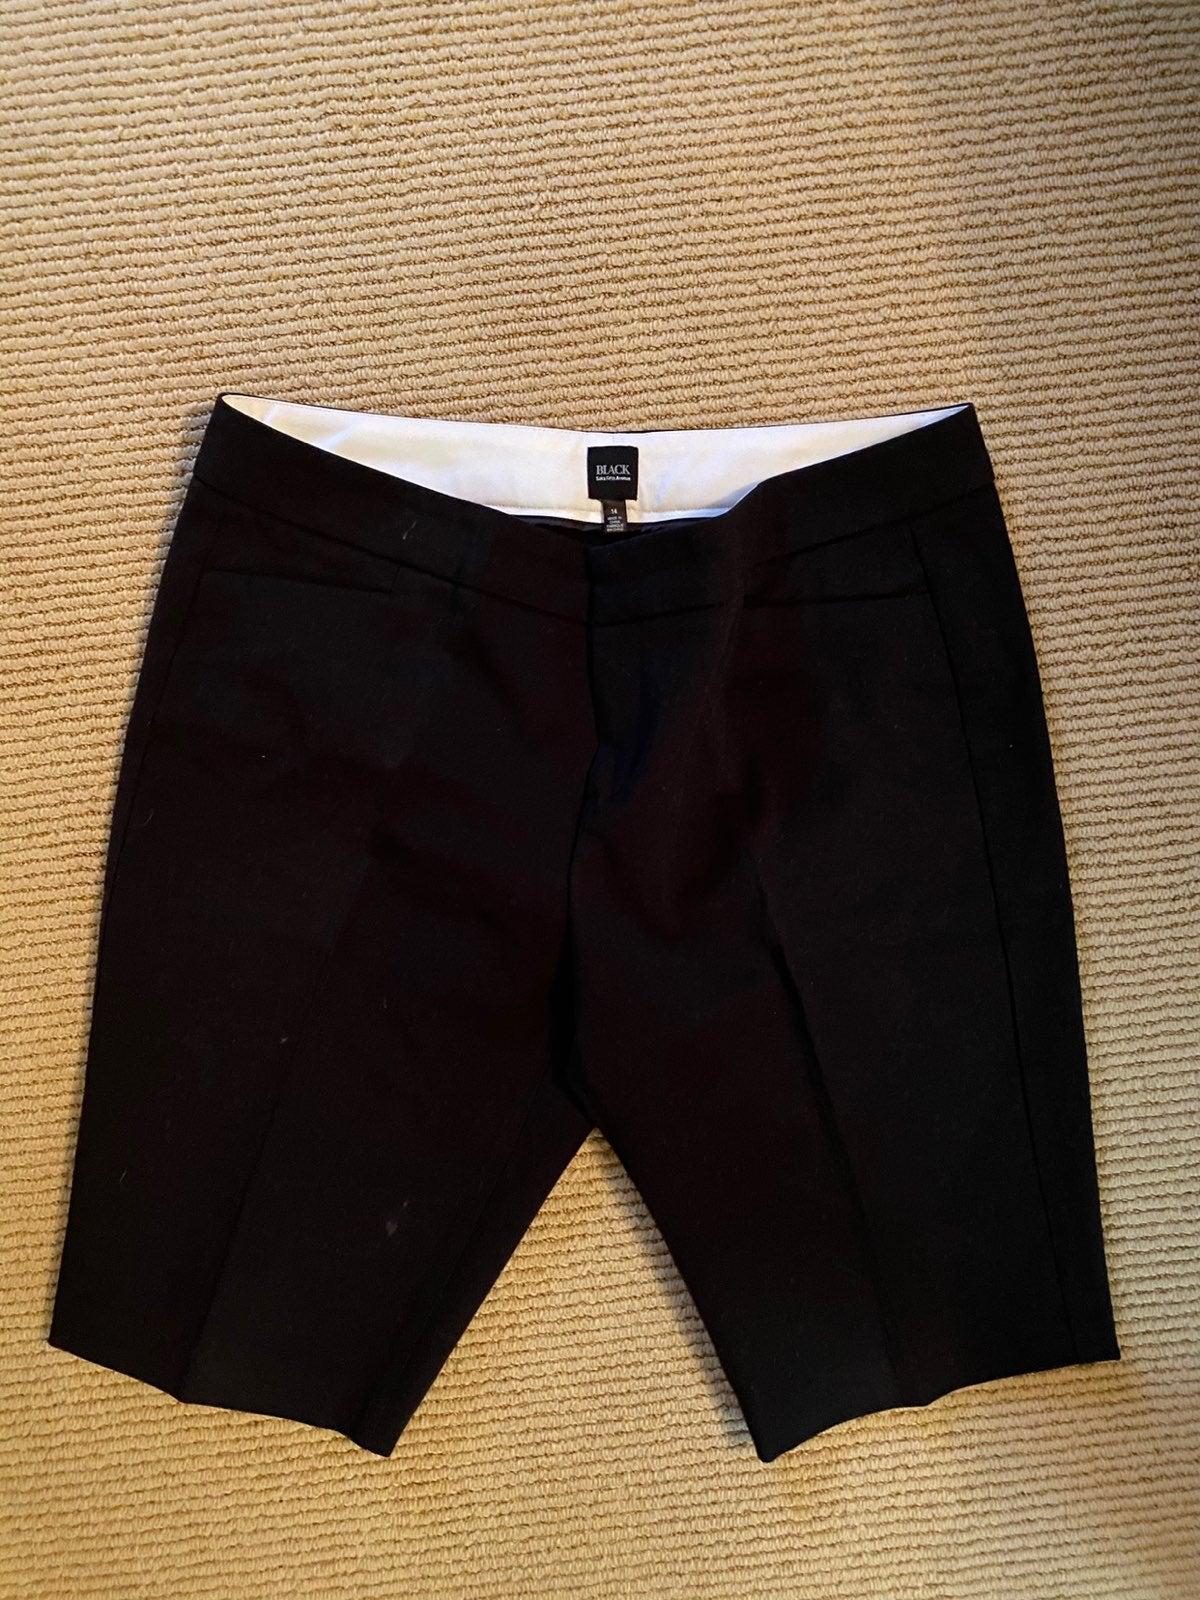 Saks fifth avenue size 14 shorts